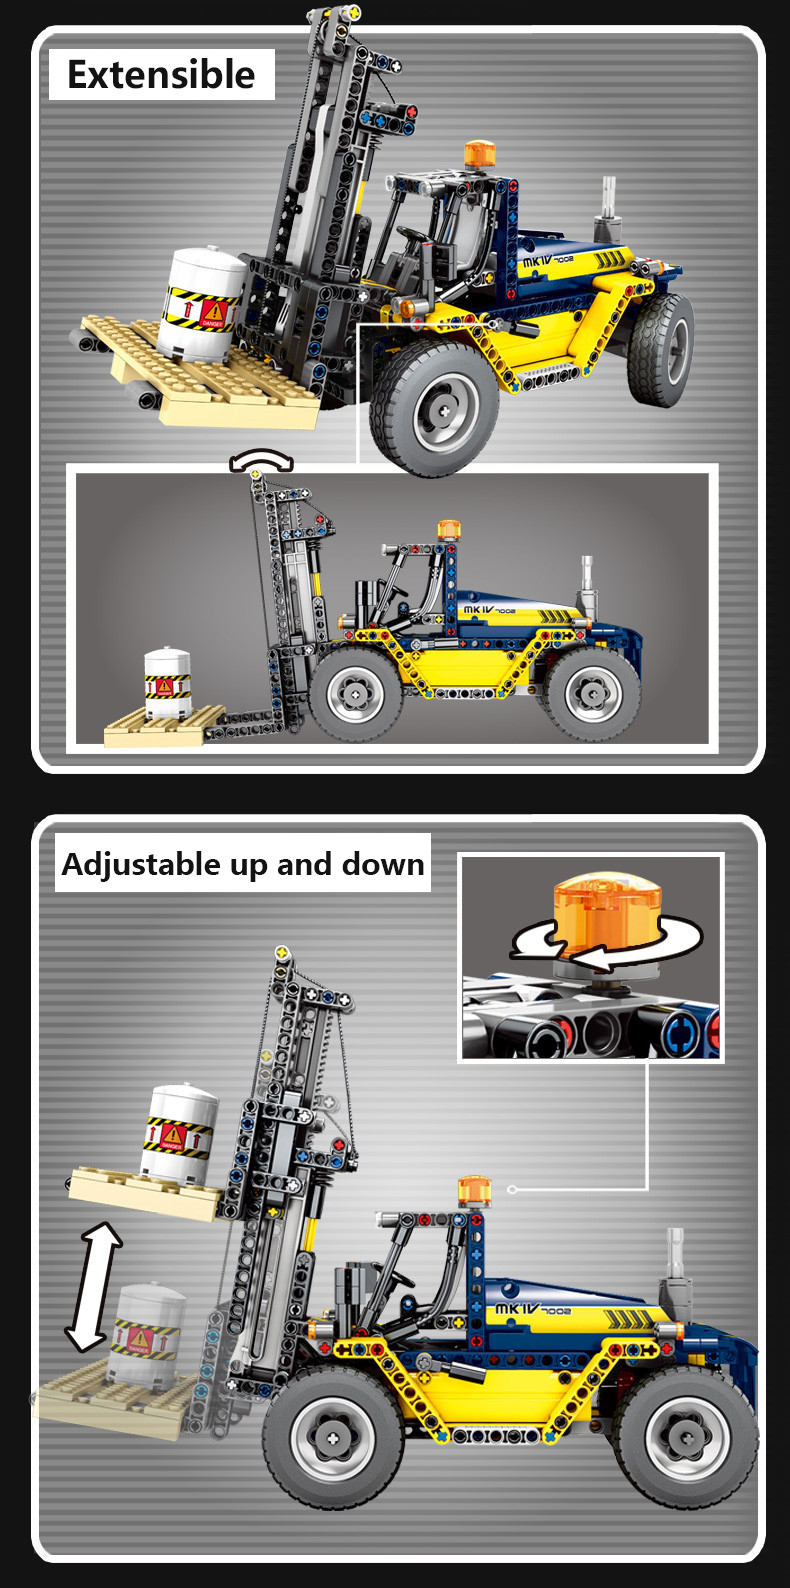 609pcs City Engineering Vehicles 2 In 1 Forklift Building Blocks Compatible Legoing Technic Truck Crane Bricks Toys For Children (4)